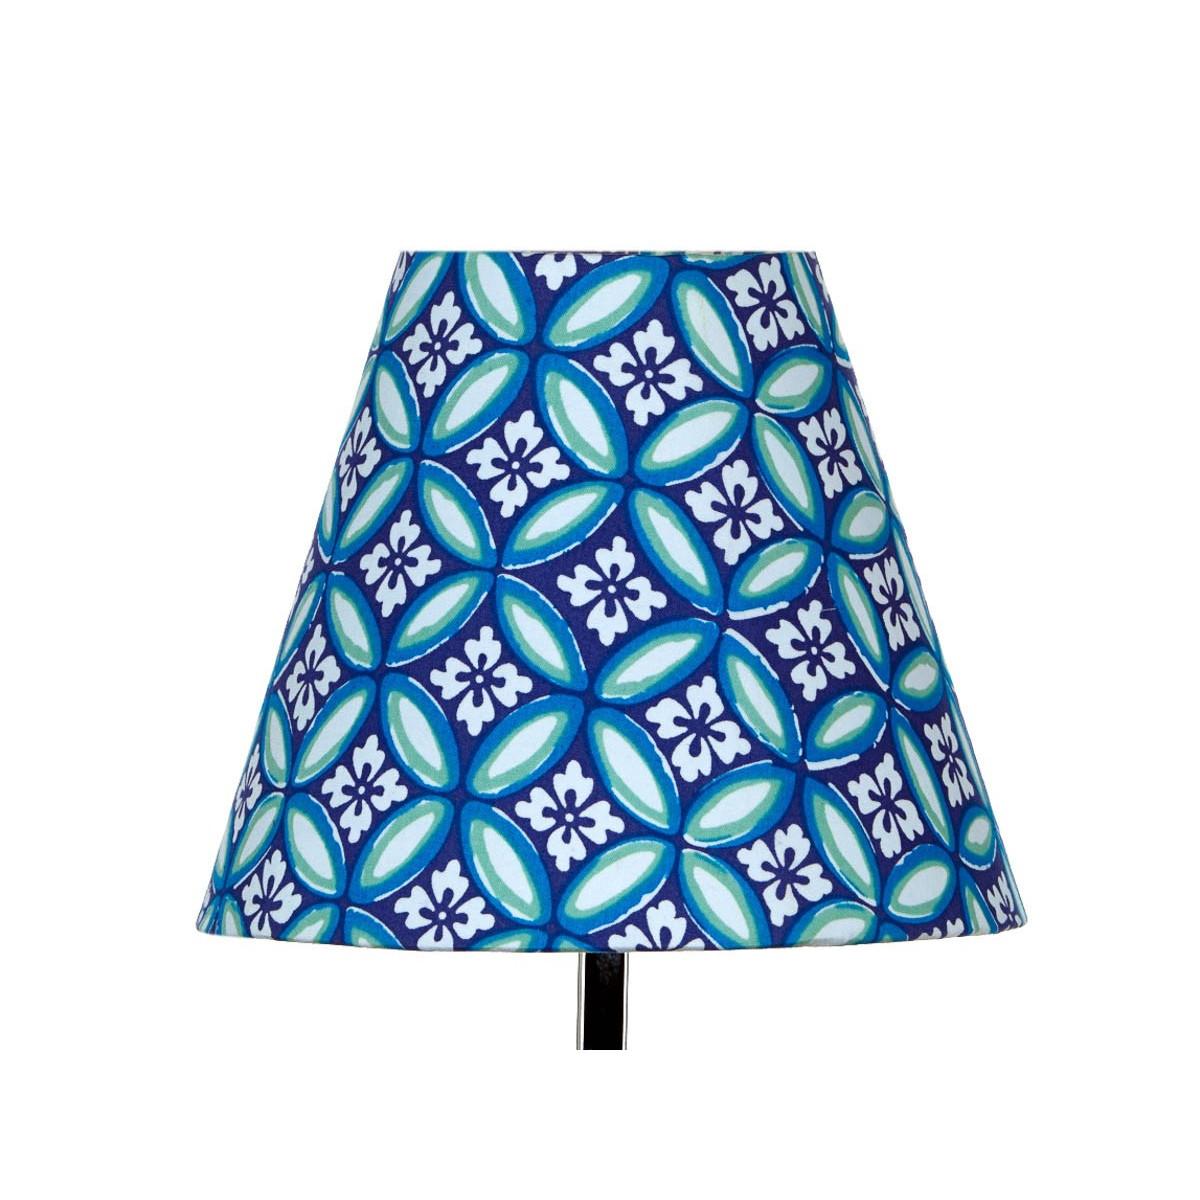 Abat jour lampe de chevet tissu bleu